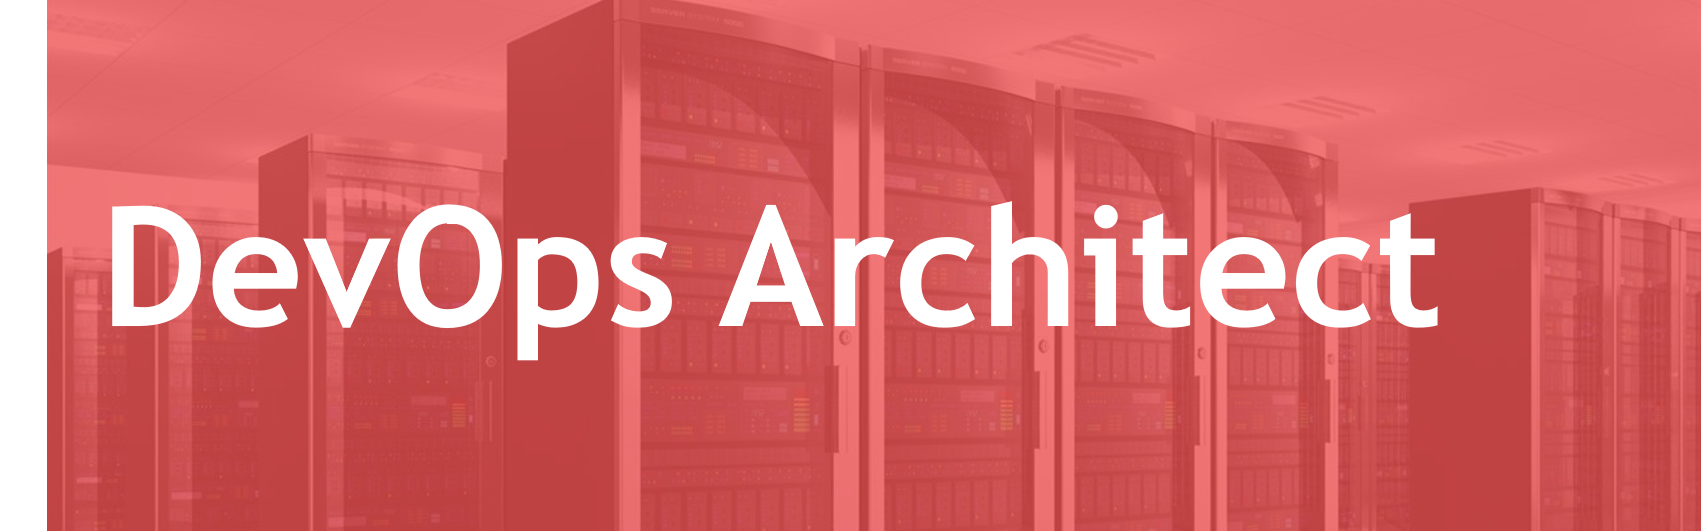 DevOps Architect - FR/EN